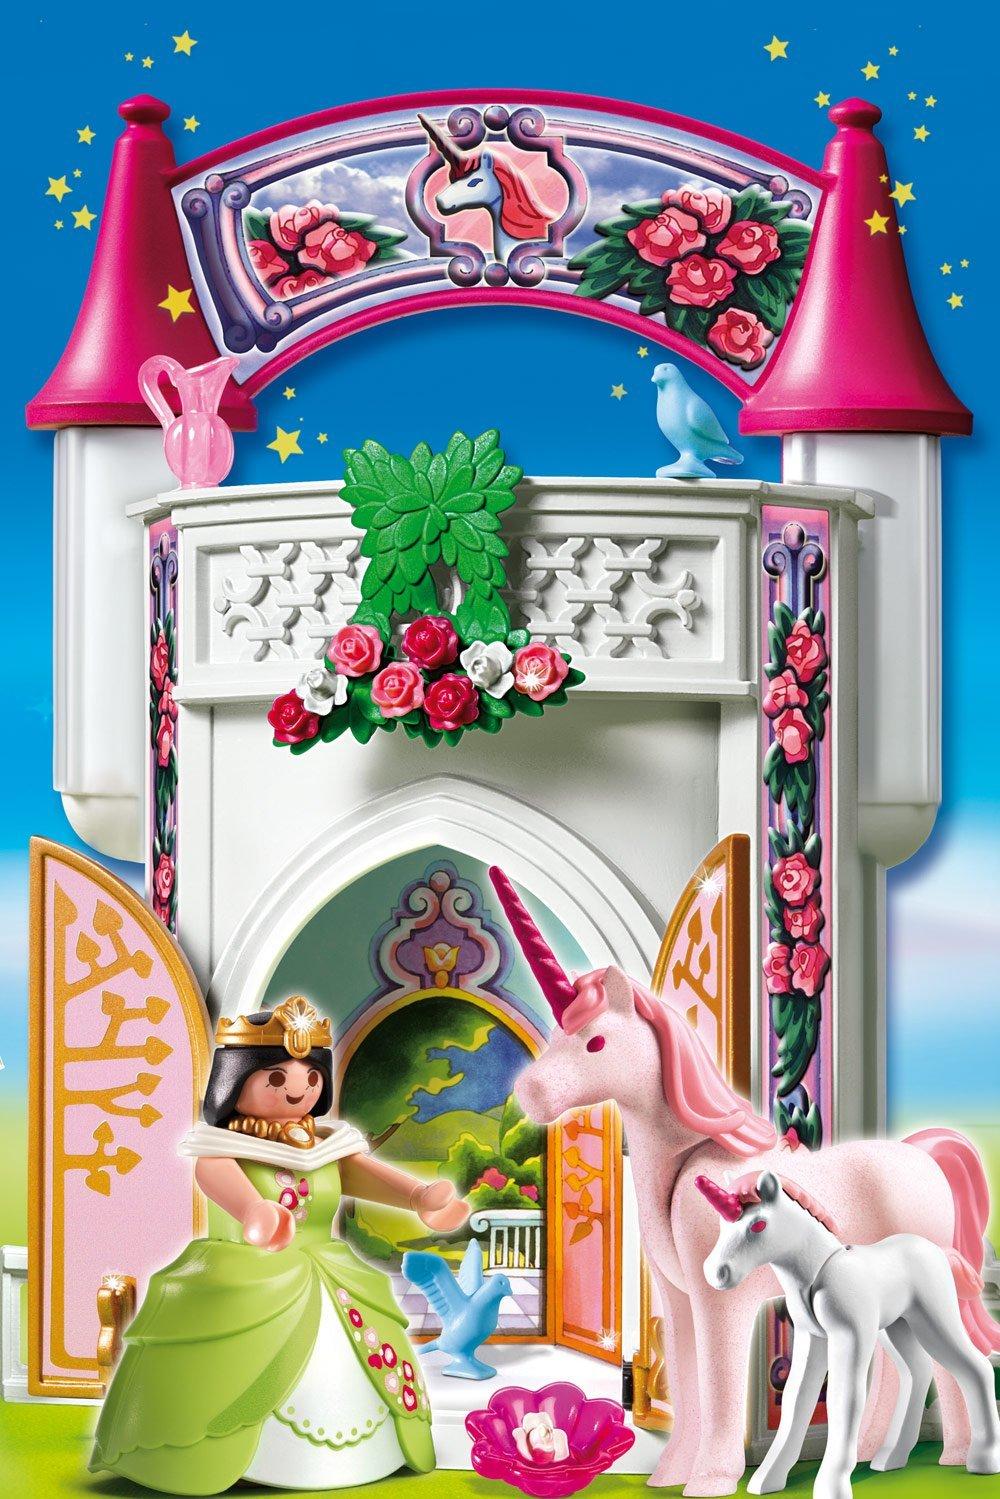 Playmobil princesse licorne - chateau u montellier